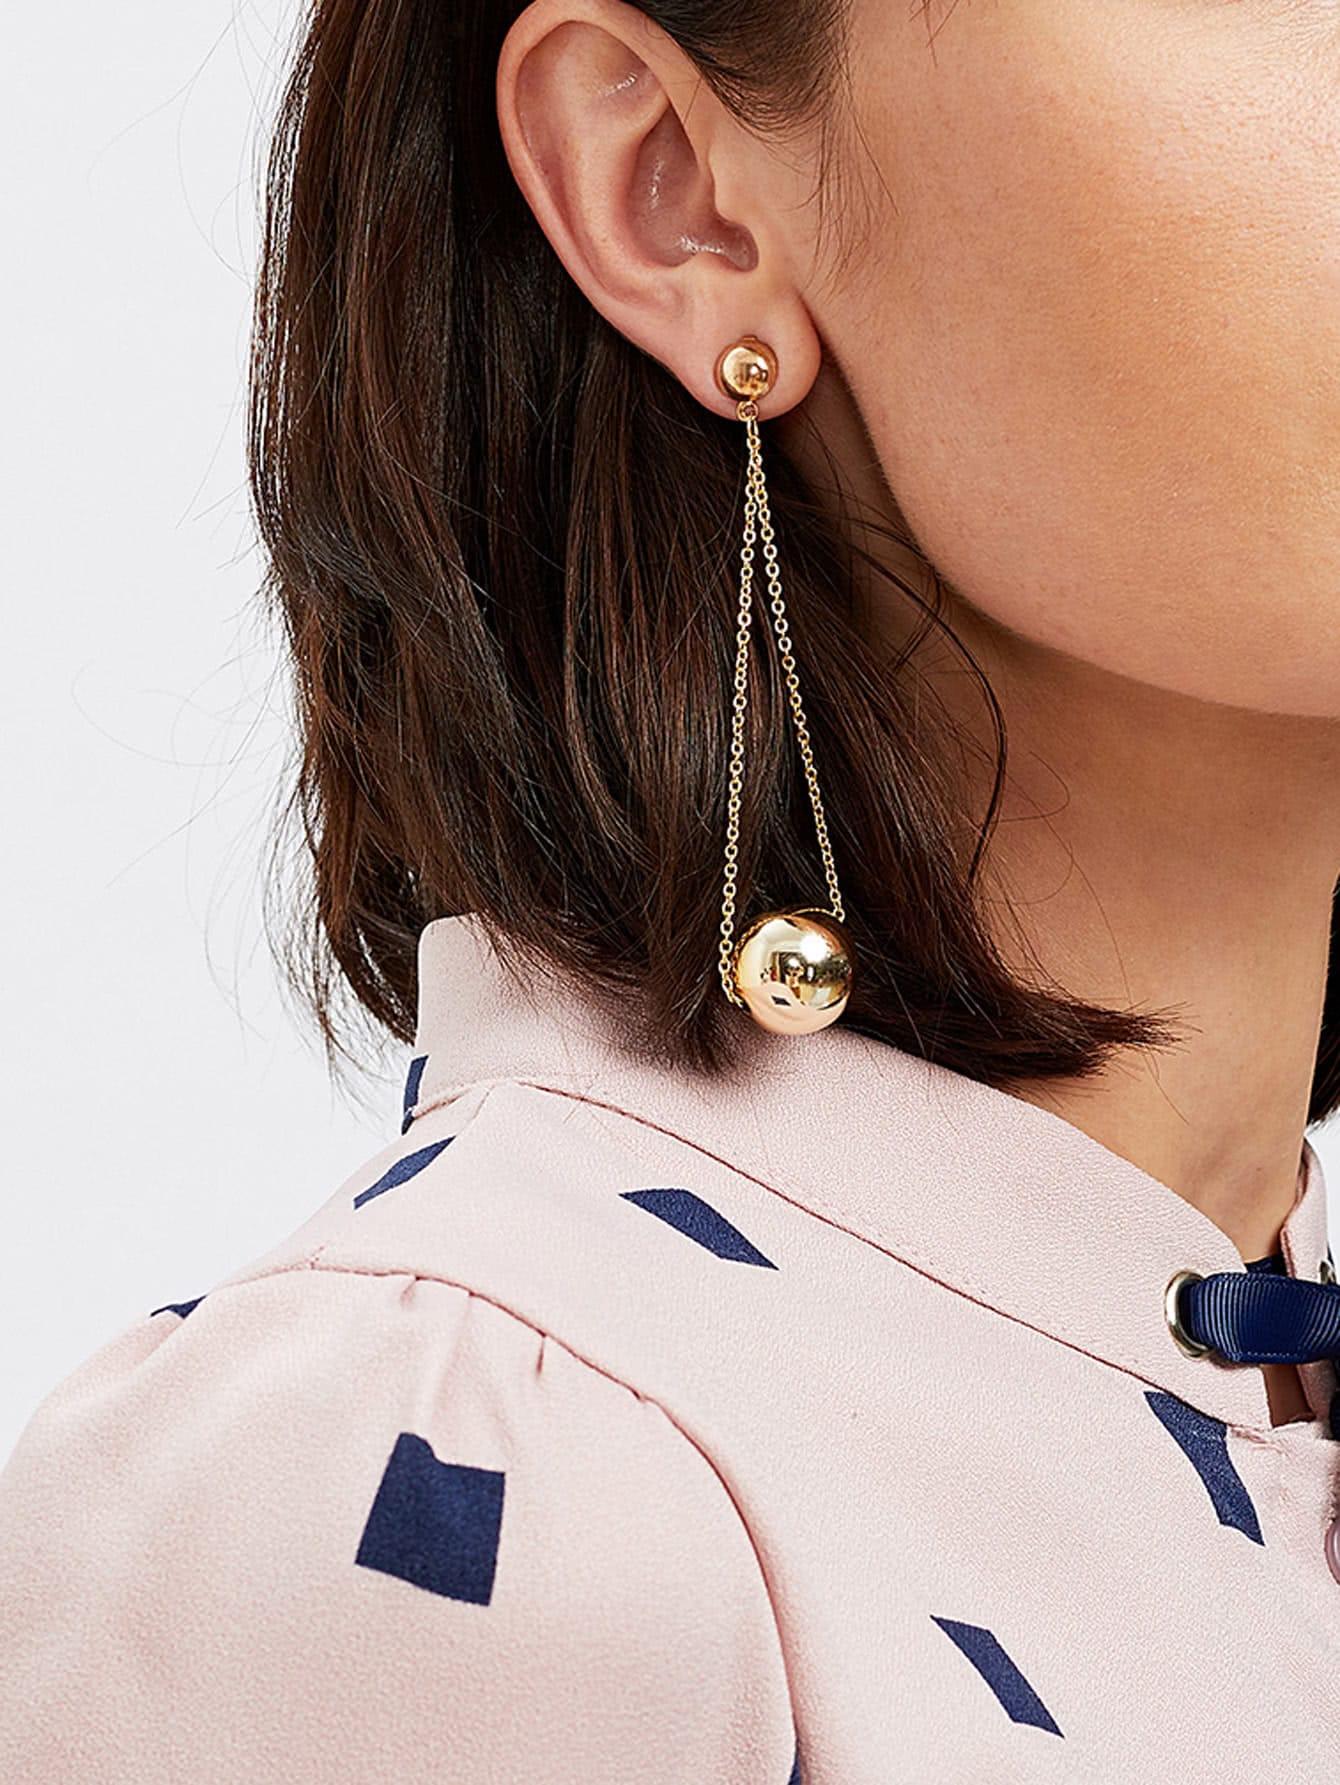 Metal Ball Design Drop Earrings earringer171019306